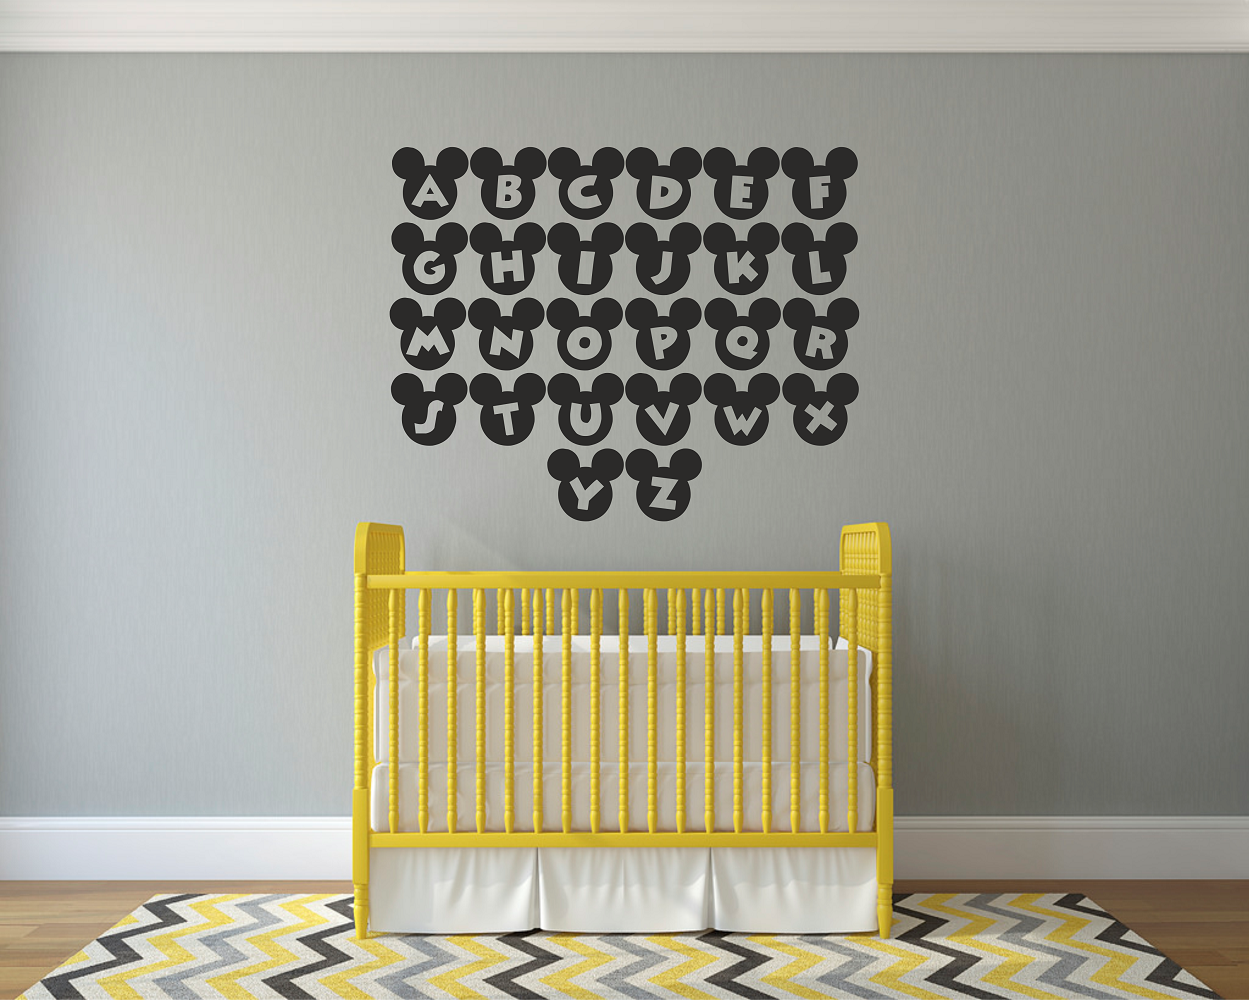 Mickey Mouse Alphabets Wall Art Decal Sticker | Logos | Pinterest ...